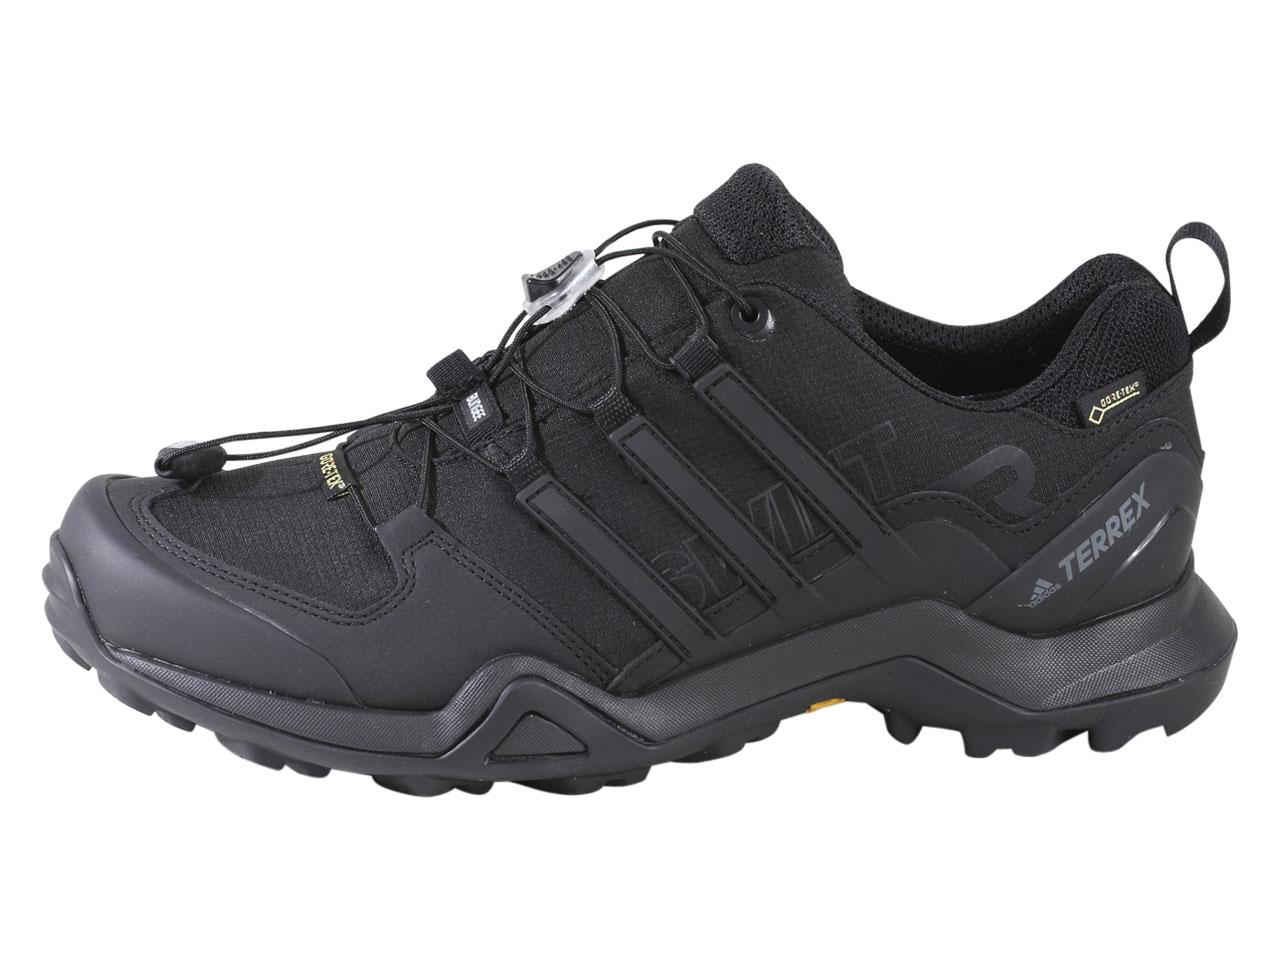 info for 6f4fd 813cf Adidas-Uomo-Terrex-Swift-R2-GTX-da-Trekking-